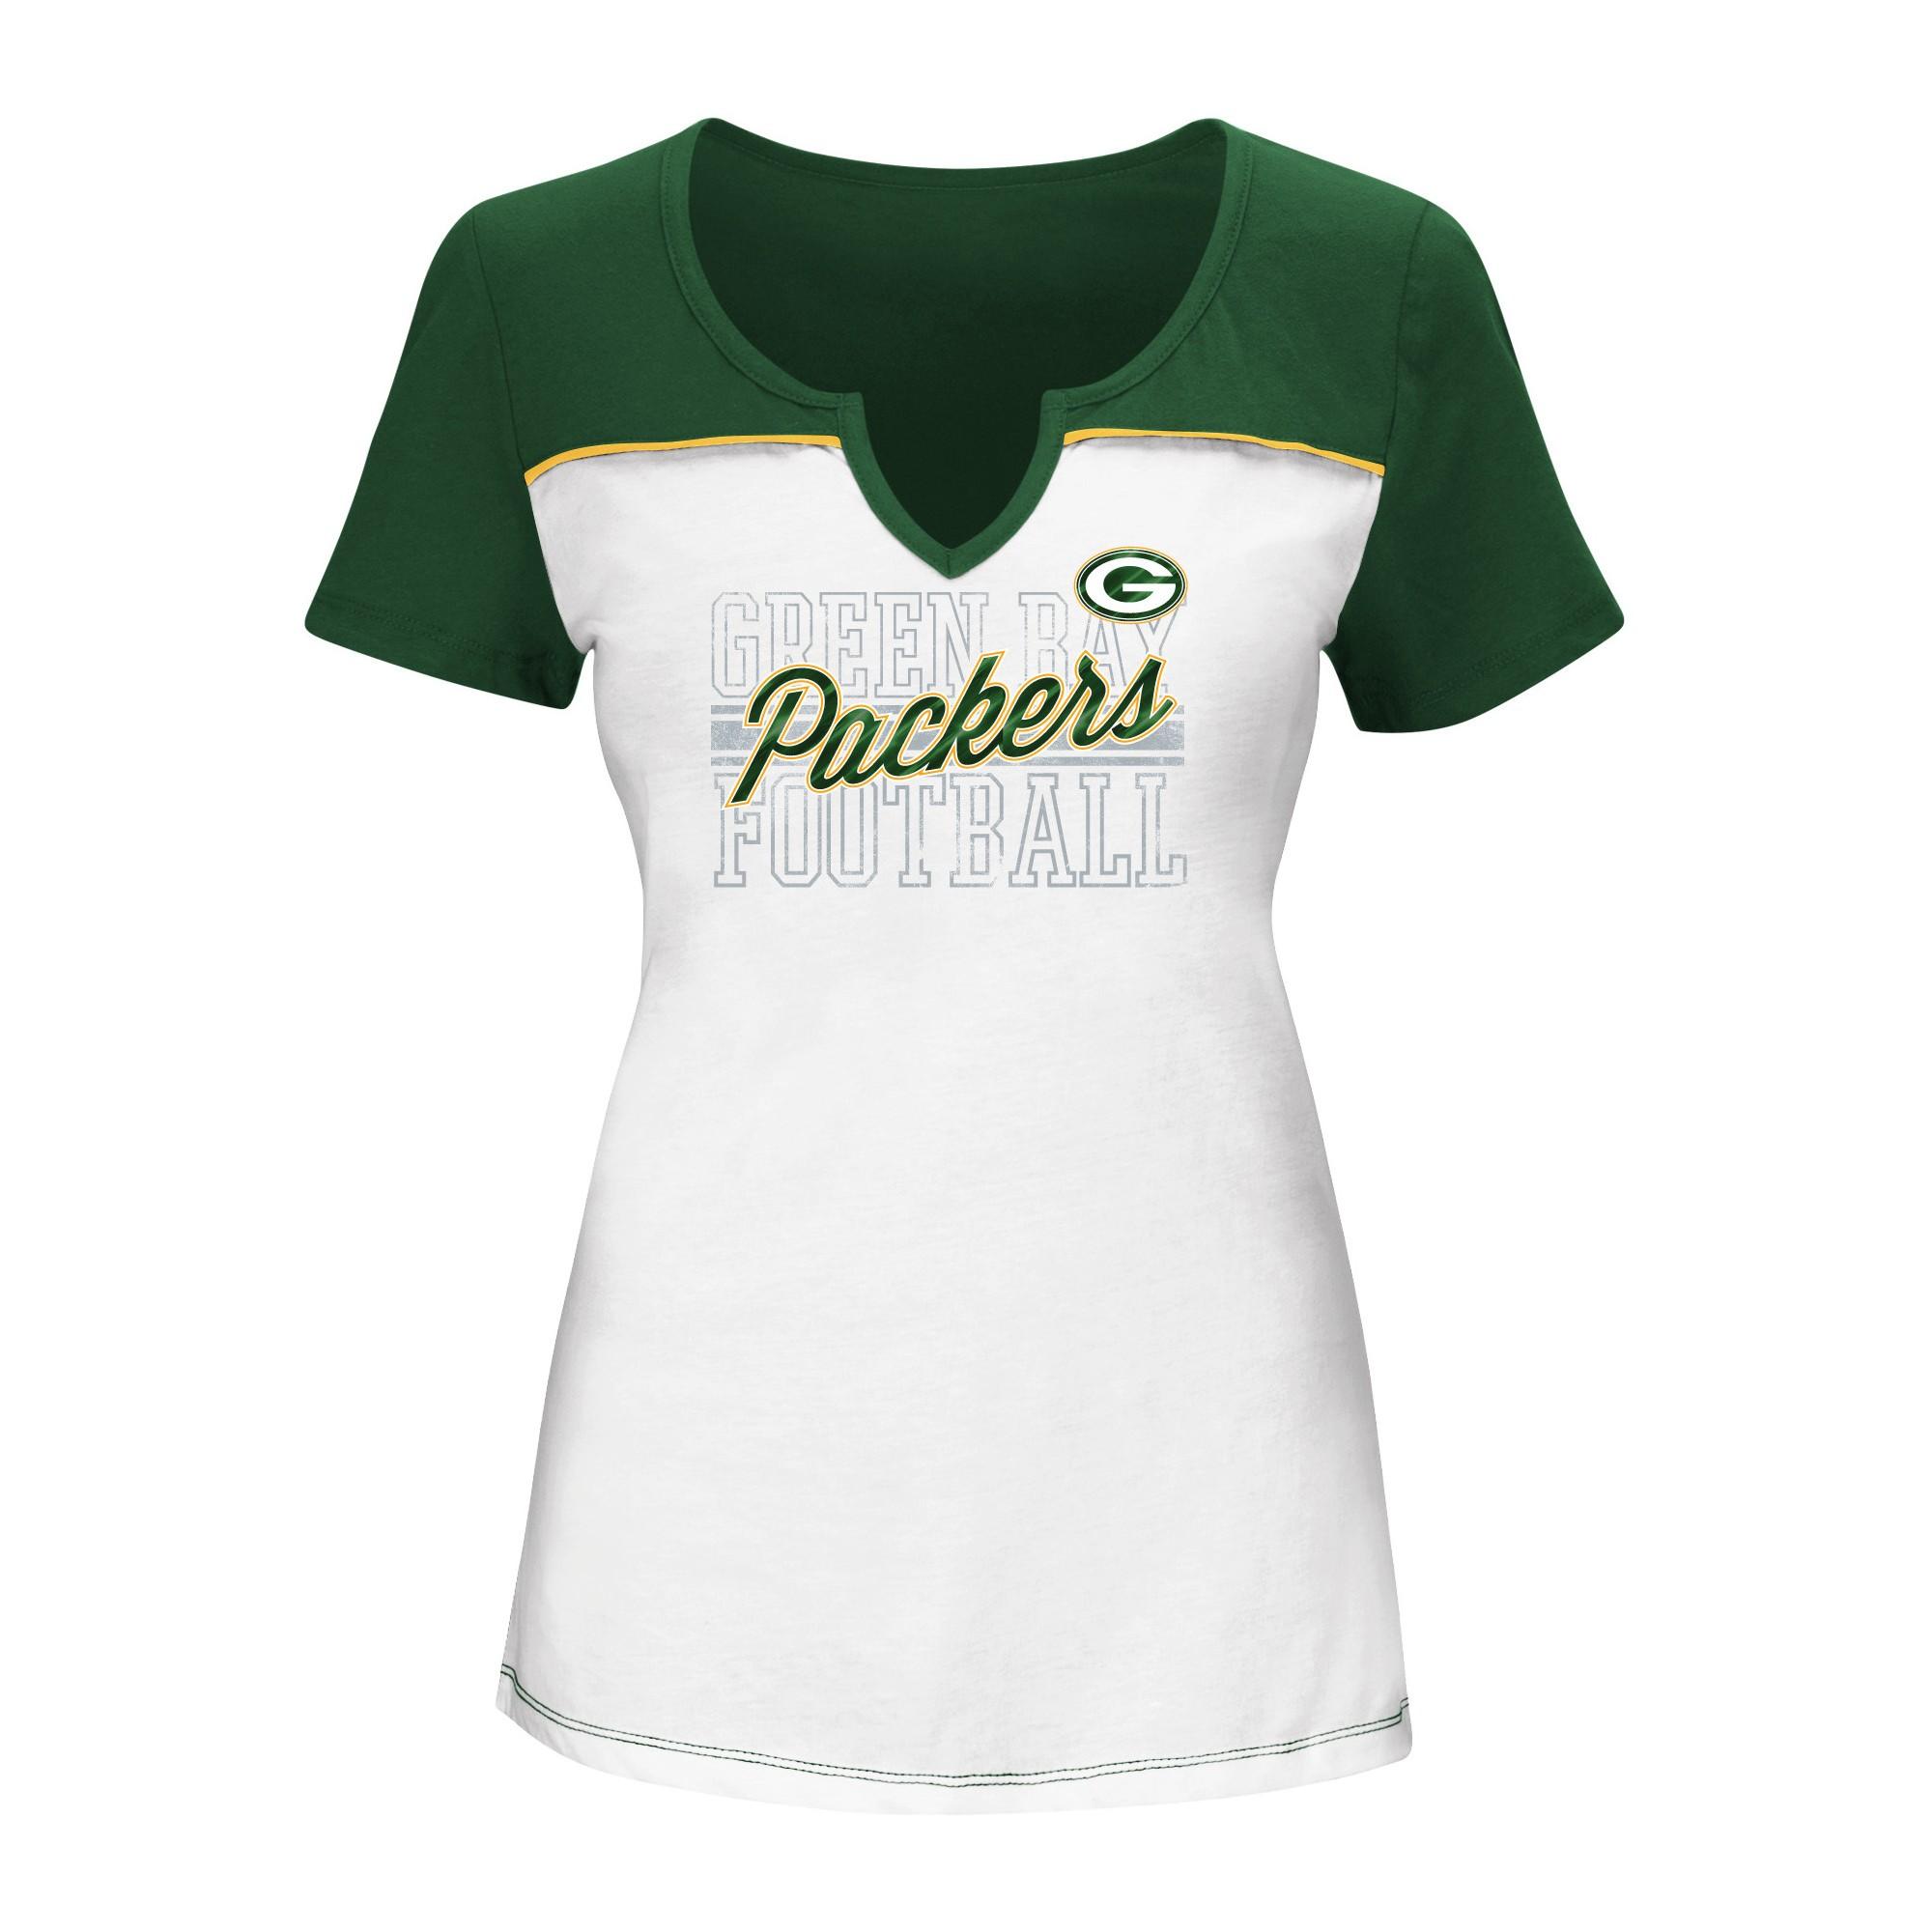 Green Bay Packers Women's Fashion TShirt XXL, Size XXL